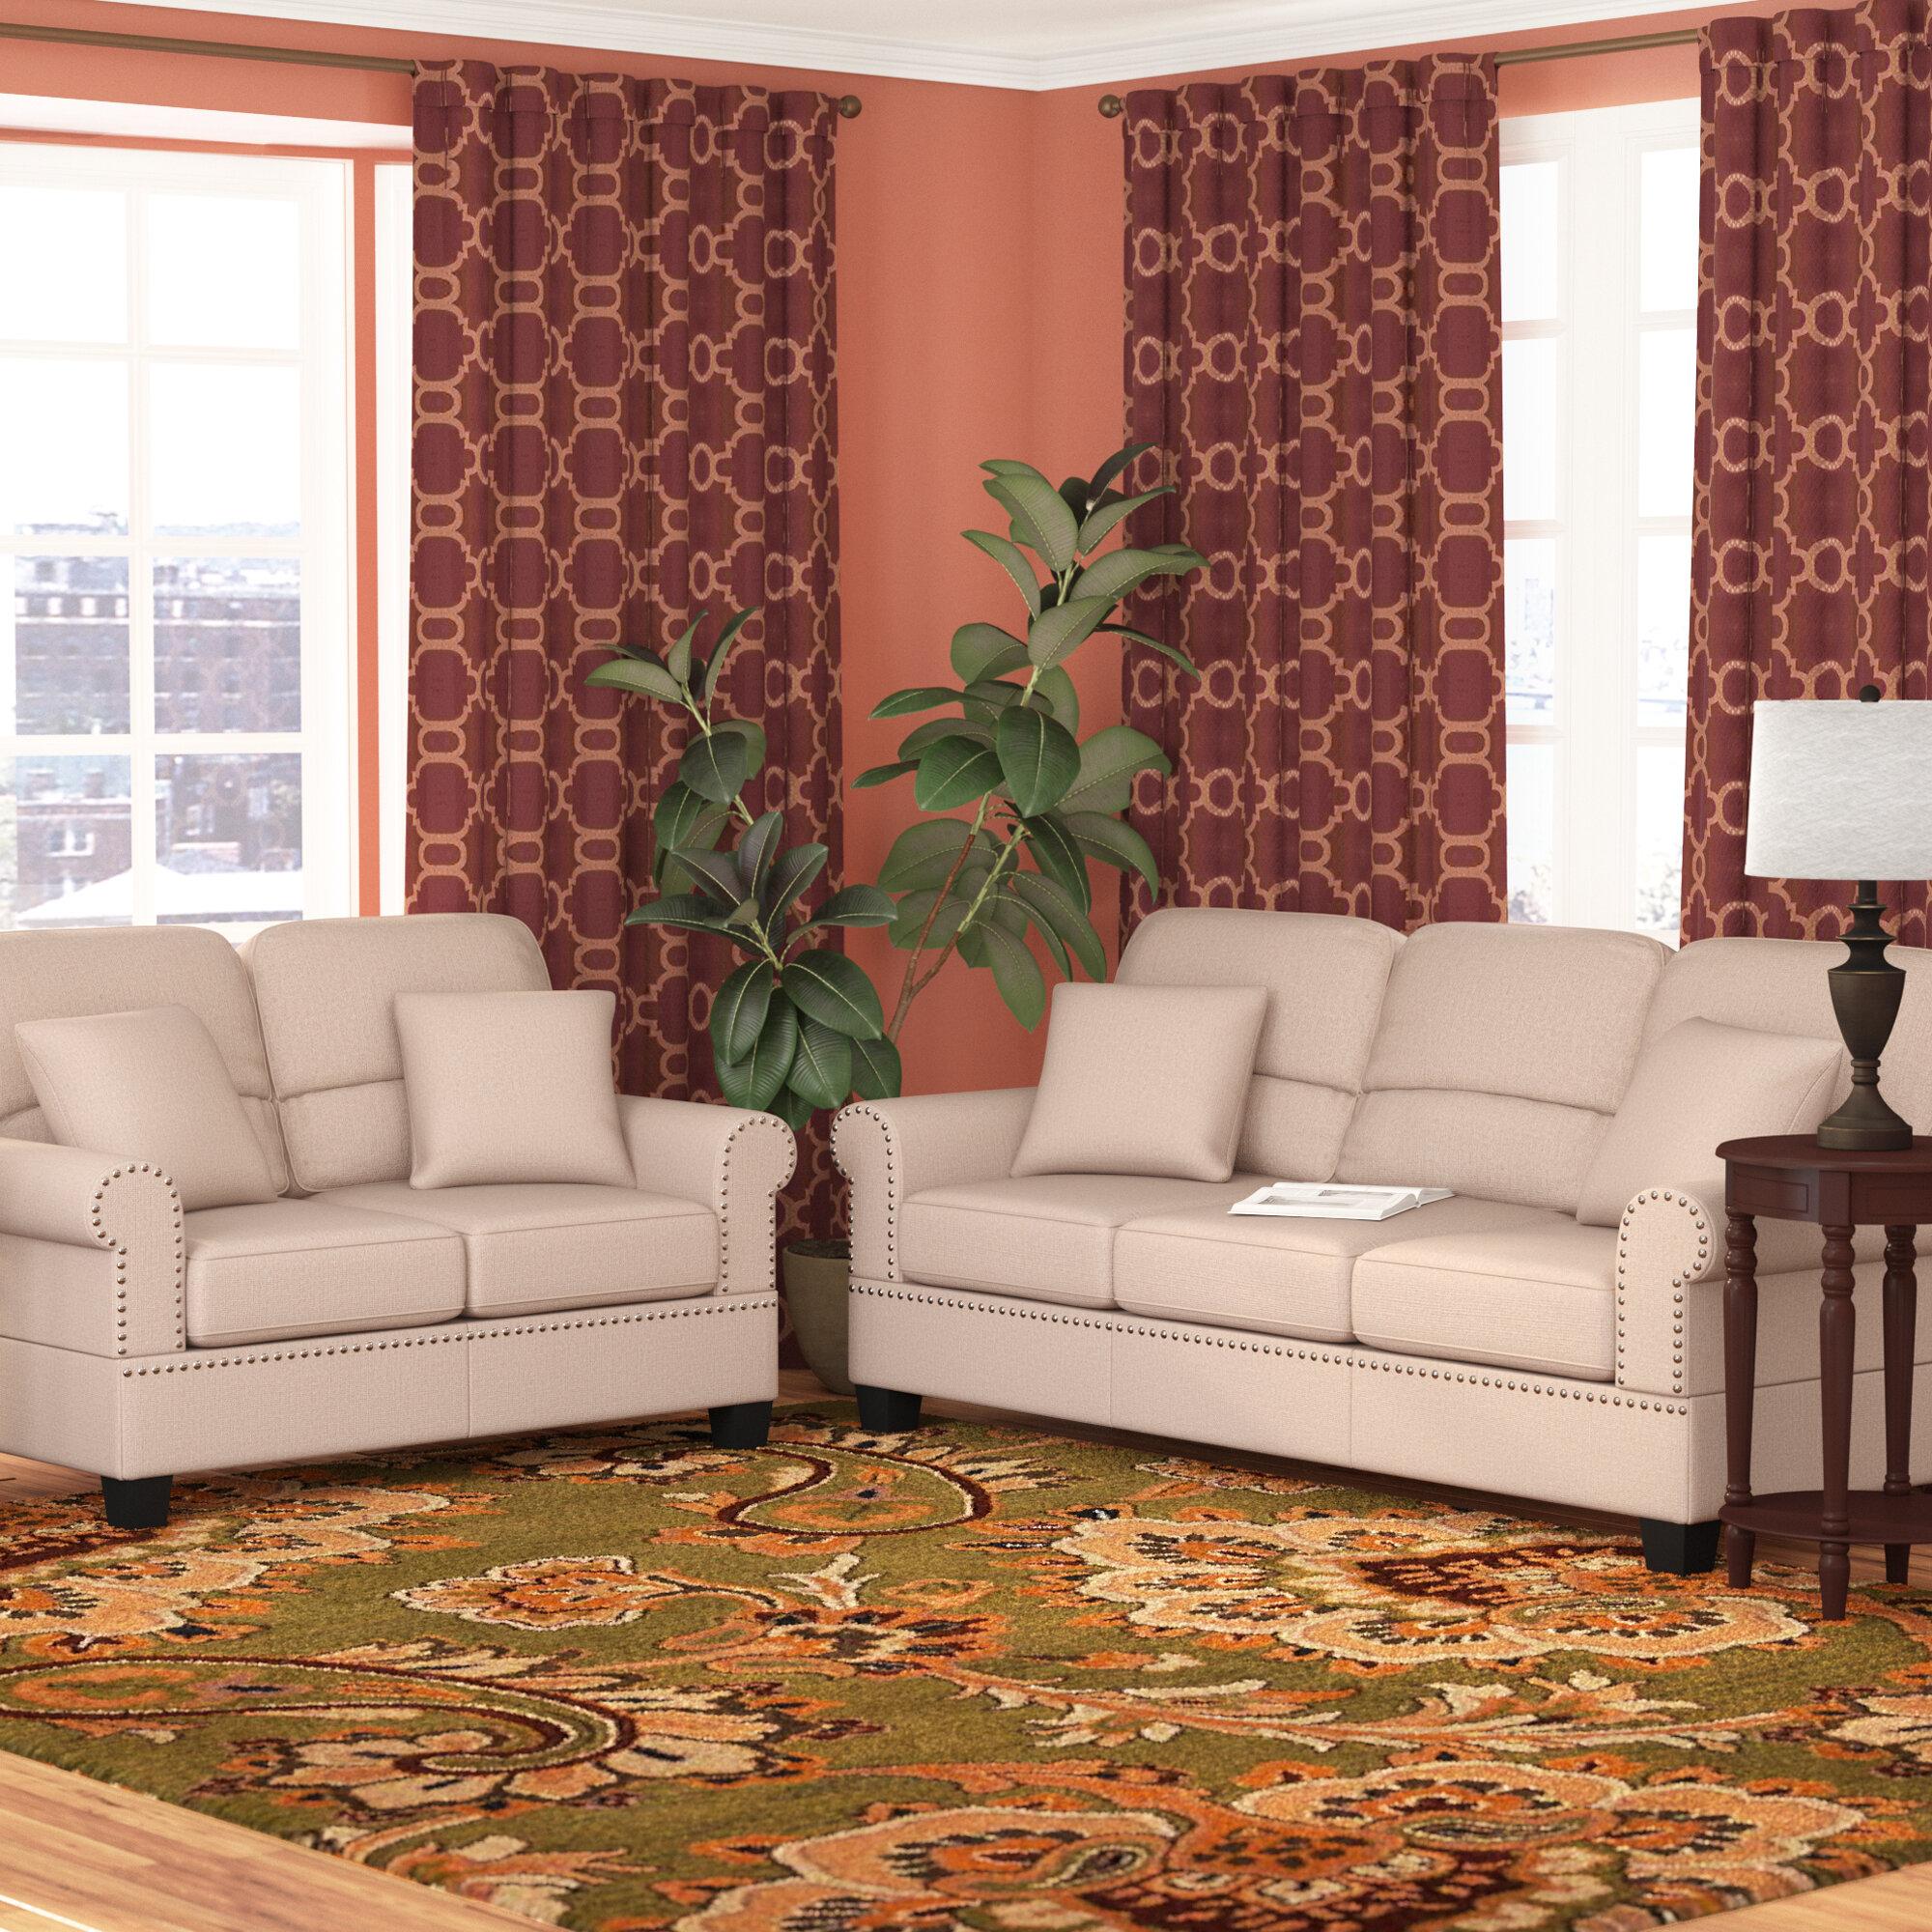 Boyster 6 Piece Living Room Set